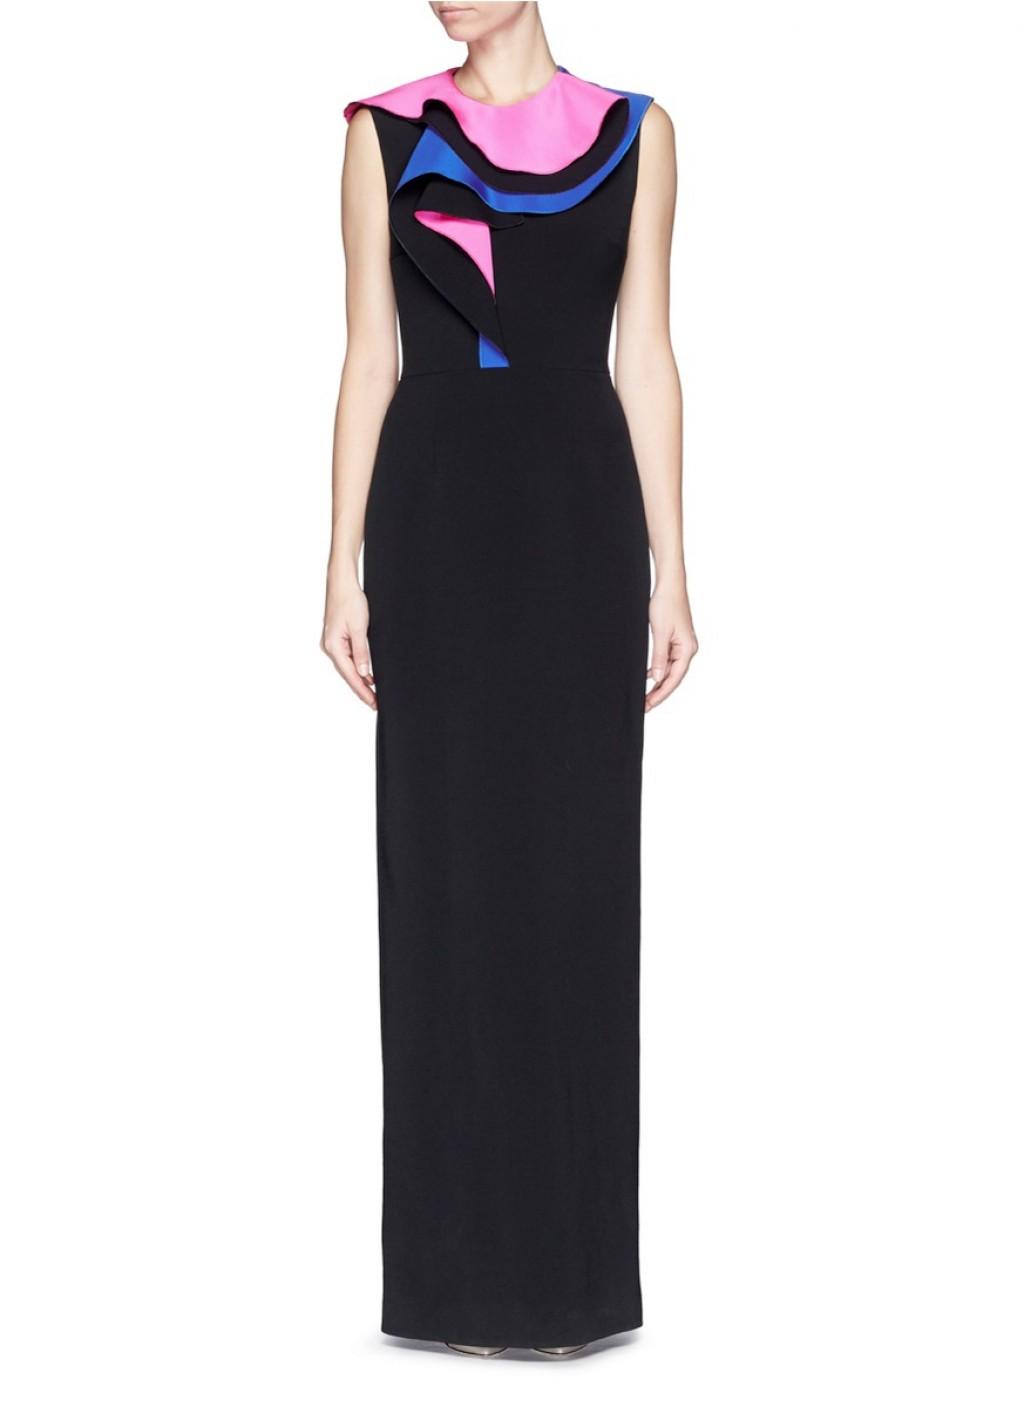 roksanda-bartlett-gown-1024x1407